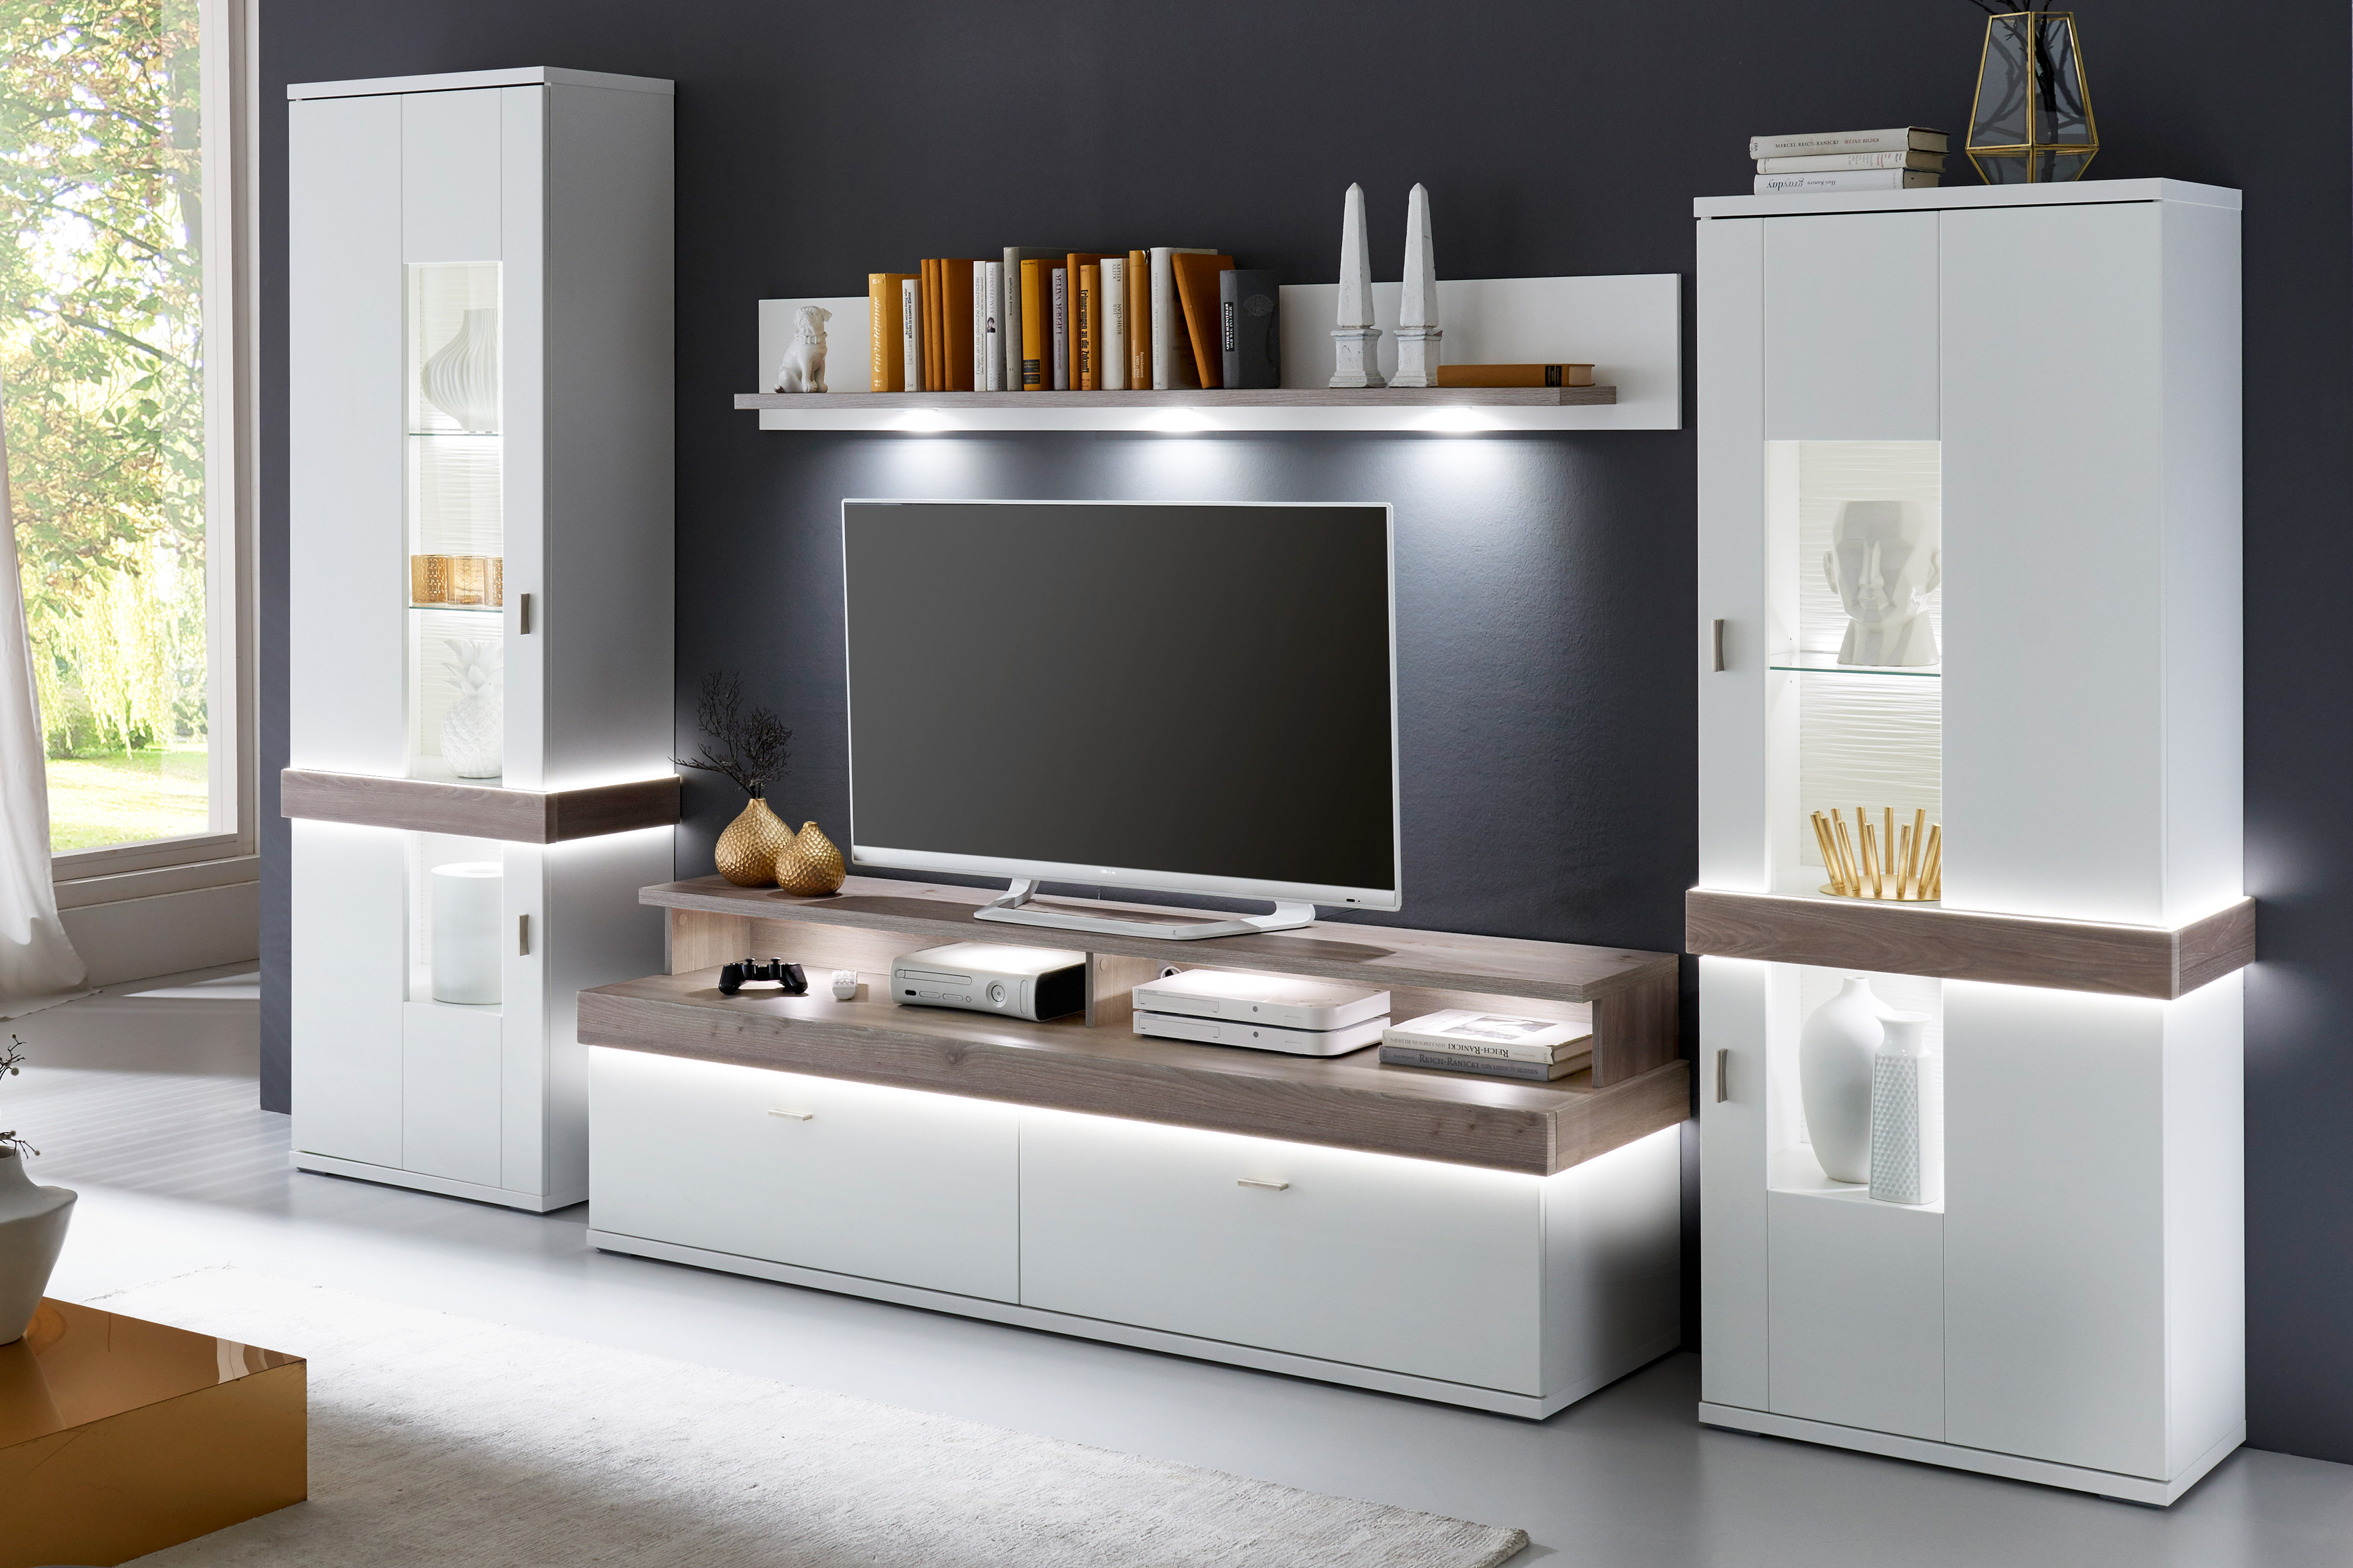 ideal m bel wohnwand albi wei nelson nordic m bel letz ihr online shop. Black Bedroom Furniture Sets. Home Design Ideas